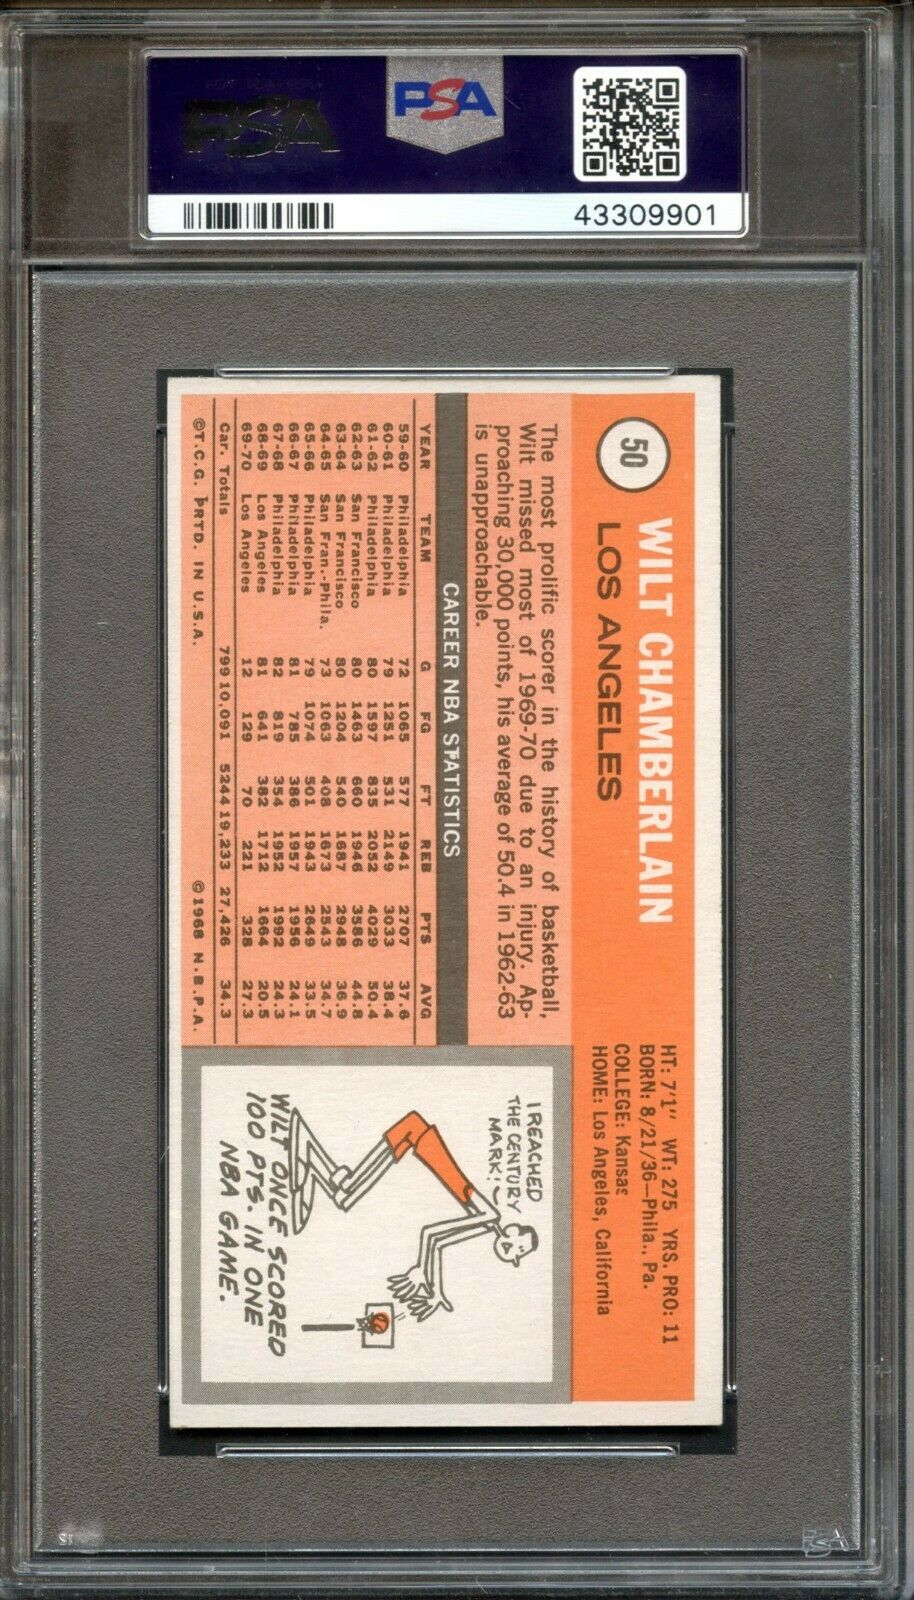 1970 Topps #50 Wilt Chamberlain PSA 8 Centered Los Angeles Lakers - Image 2